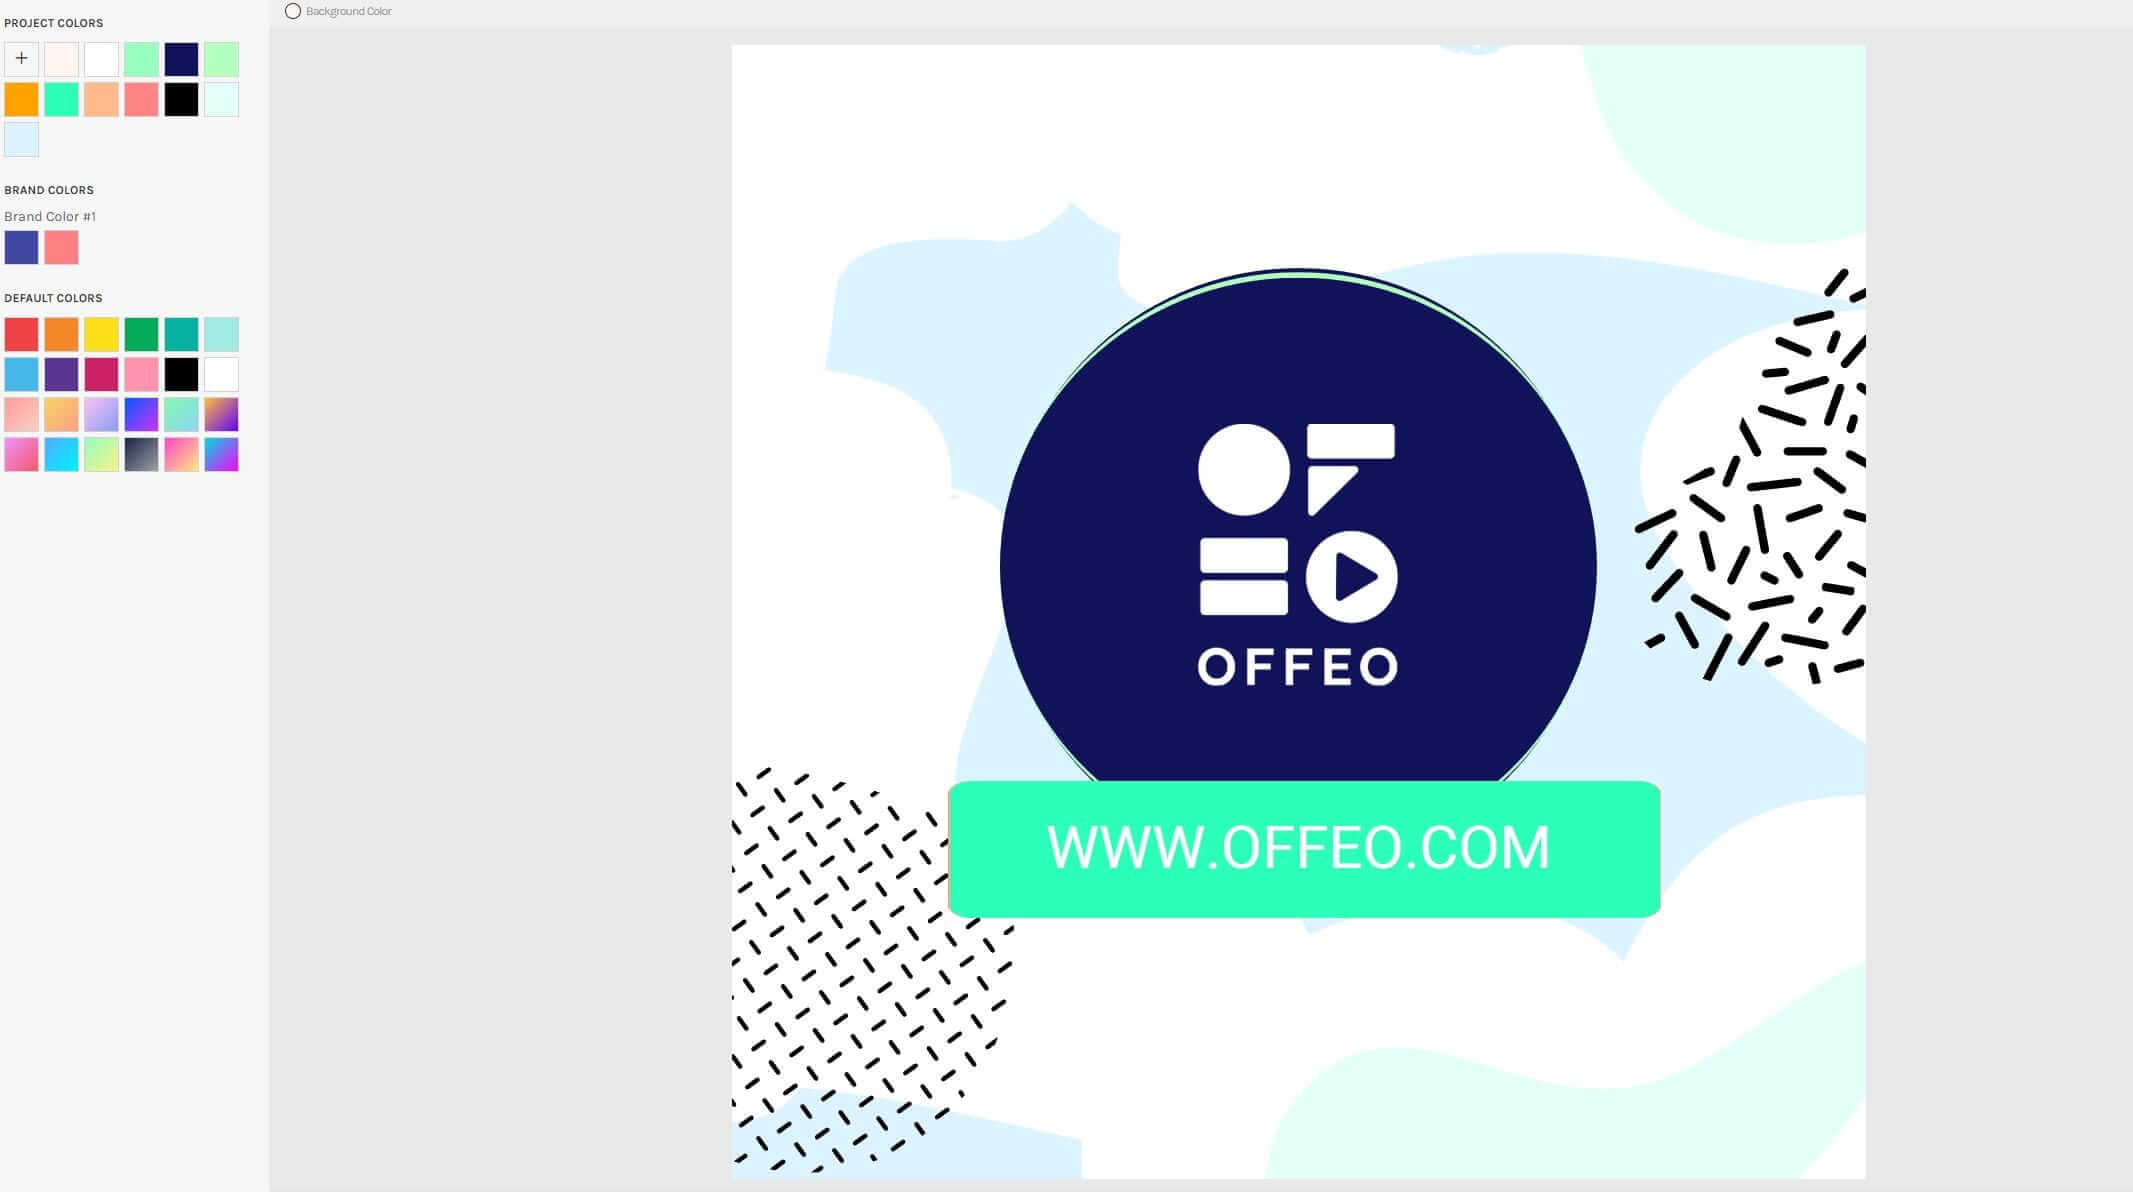 OFFEO Premium Screenshot